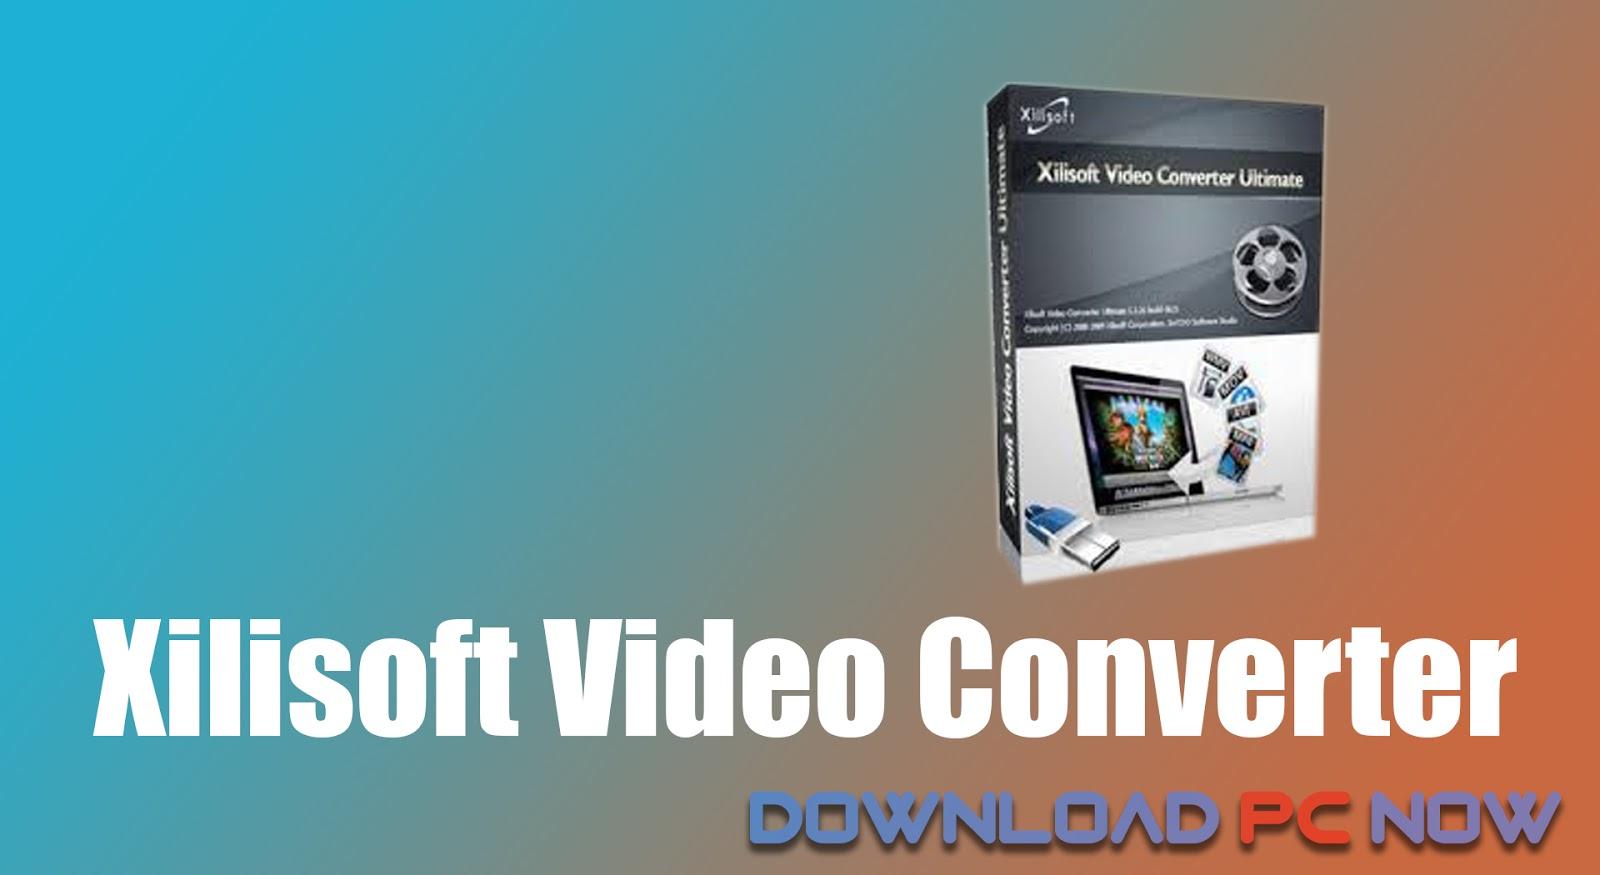 XILISOFT 7.8.21 CONVERTER ULTIMATE TÉLÉCHARGER VIDEO